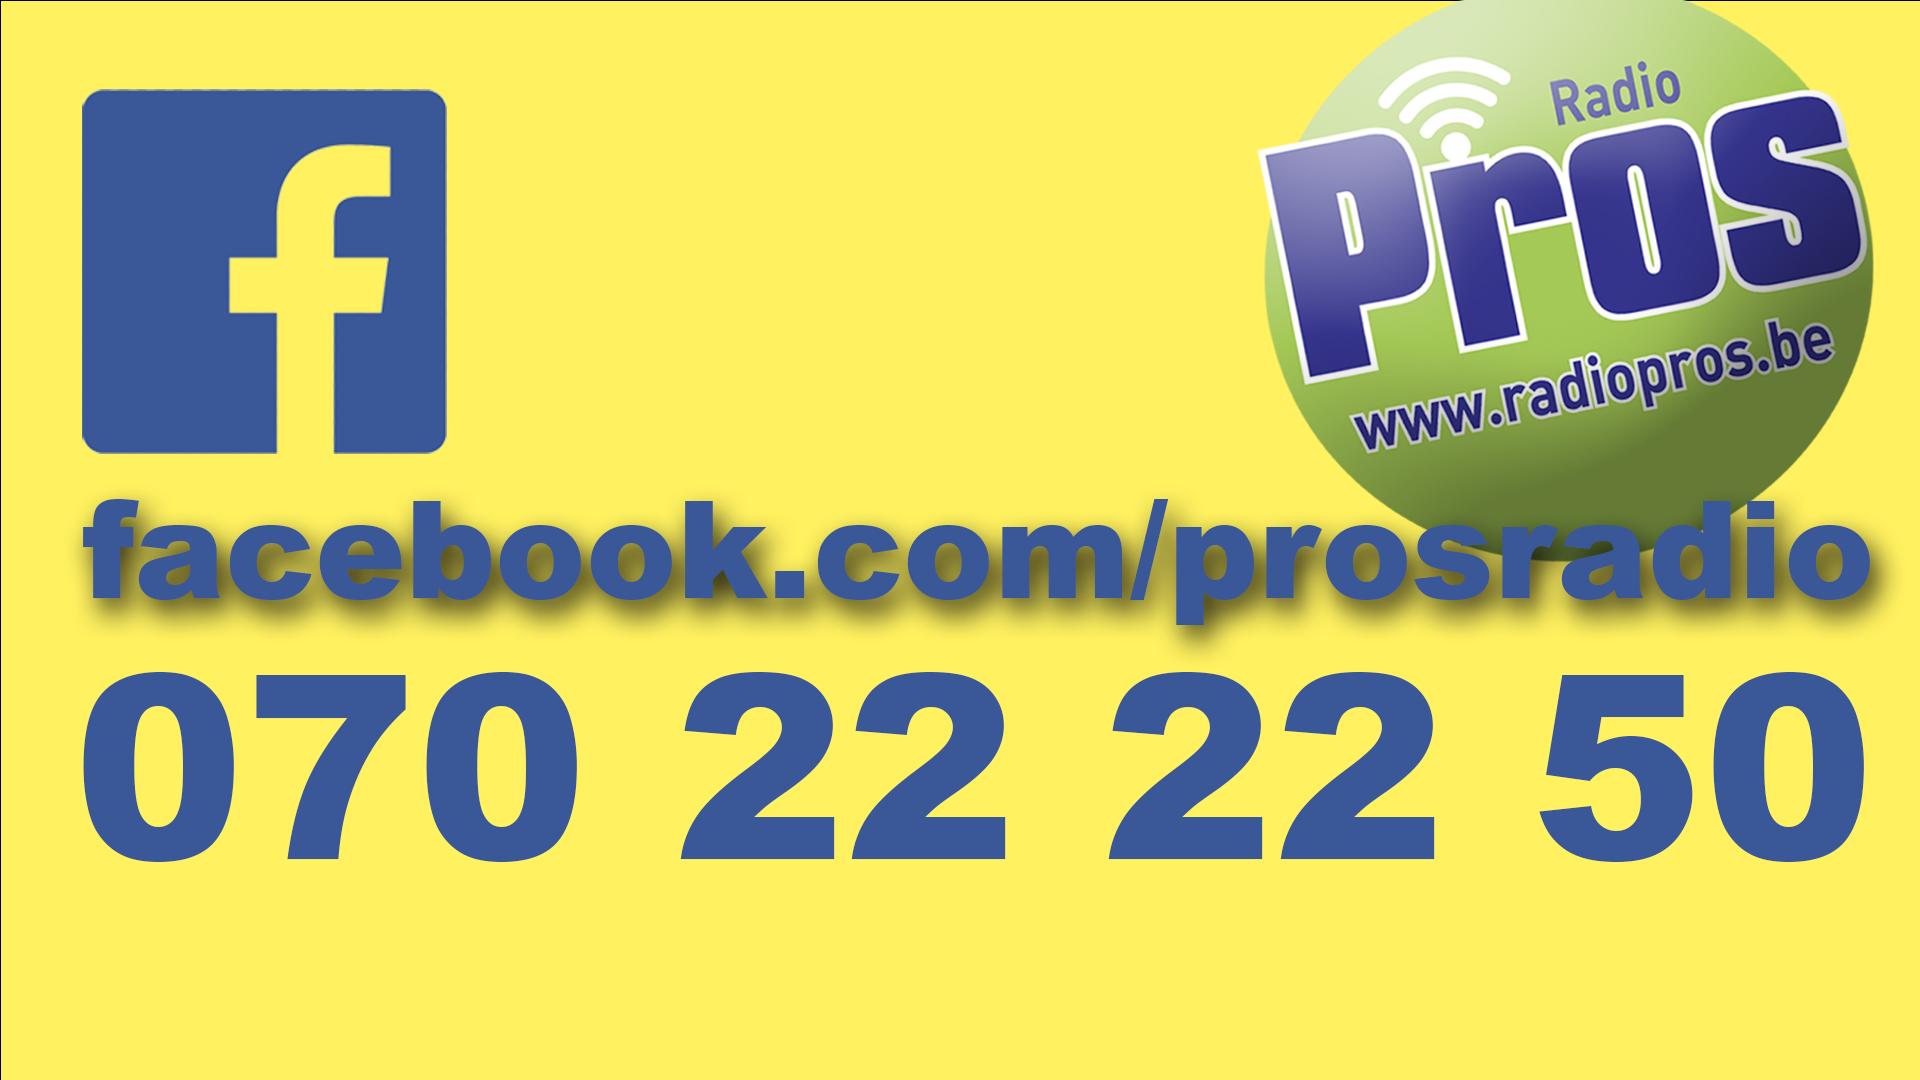 telefoonfacebook